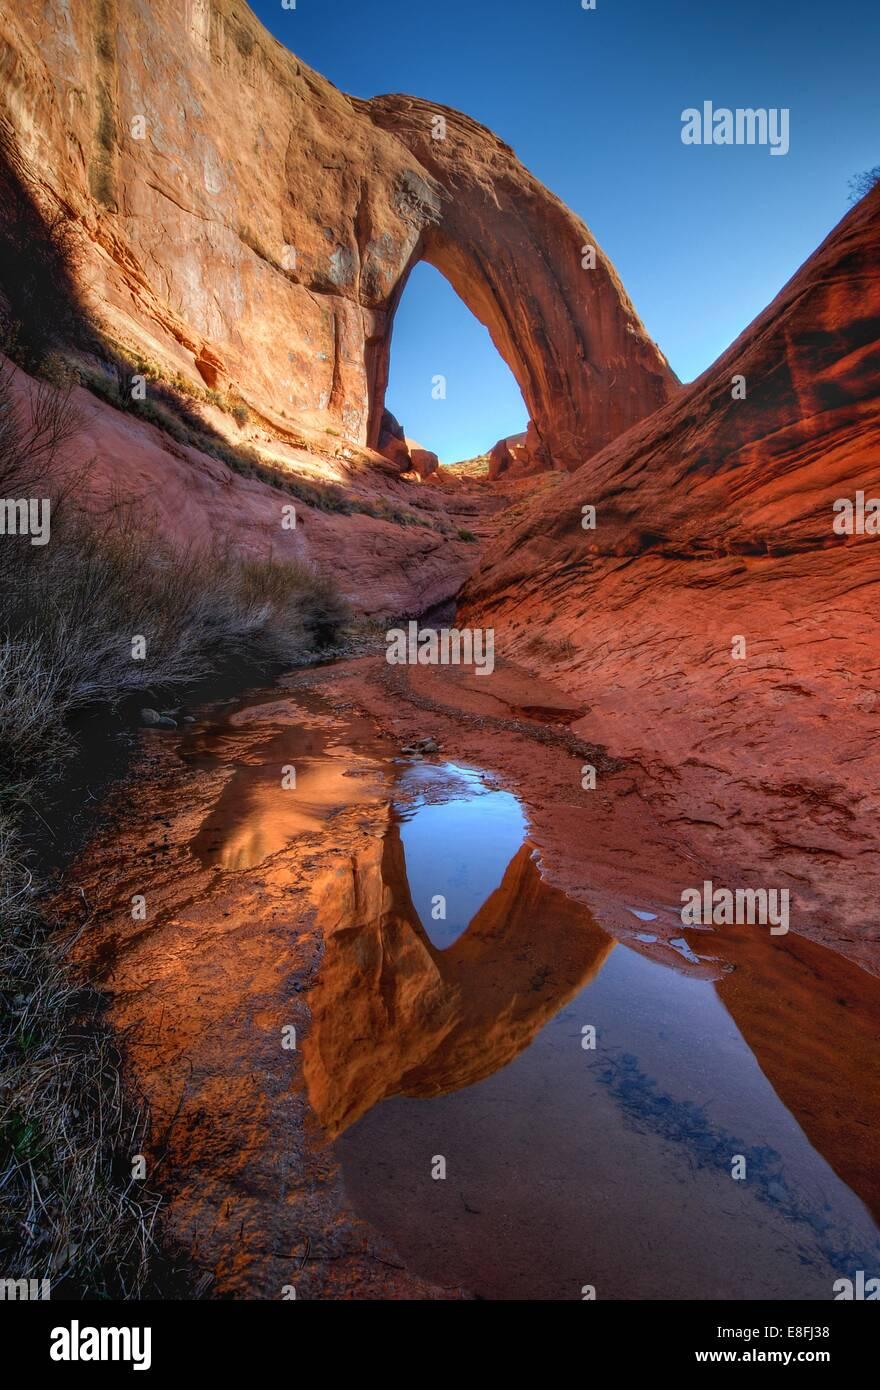 USA, Utah, Glen Canyon National Recreation Area, Reflection of Broken Bow Arch - Stock Image